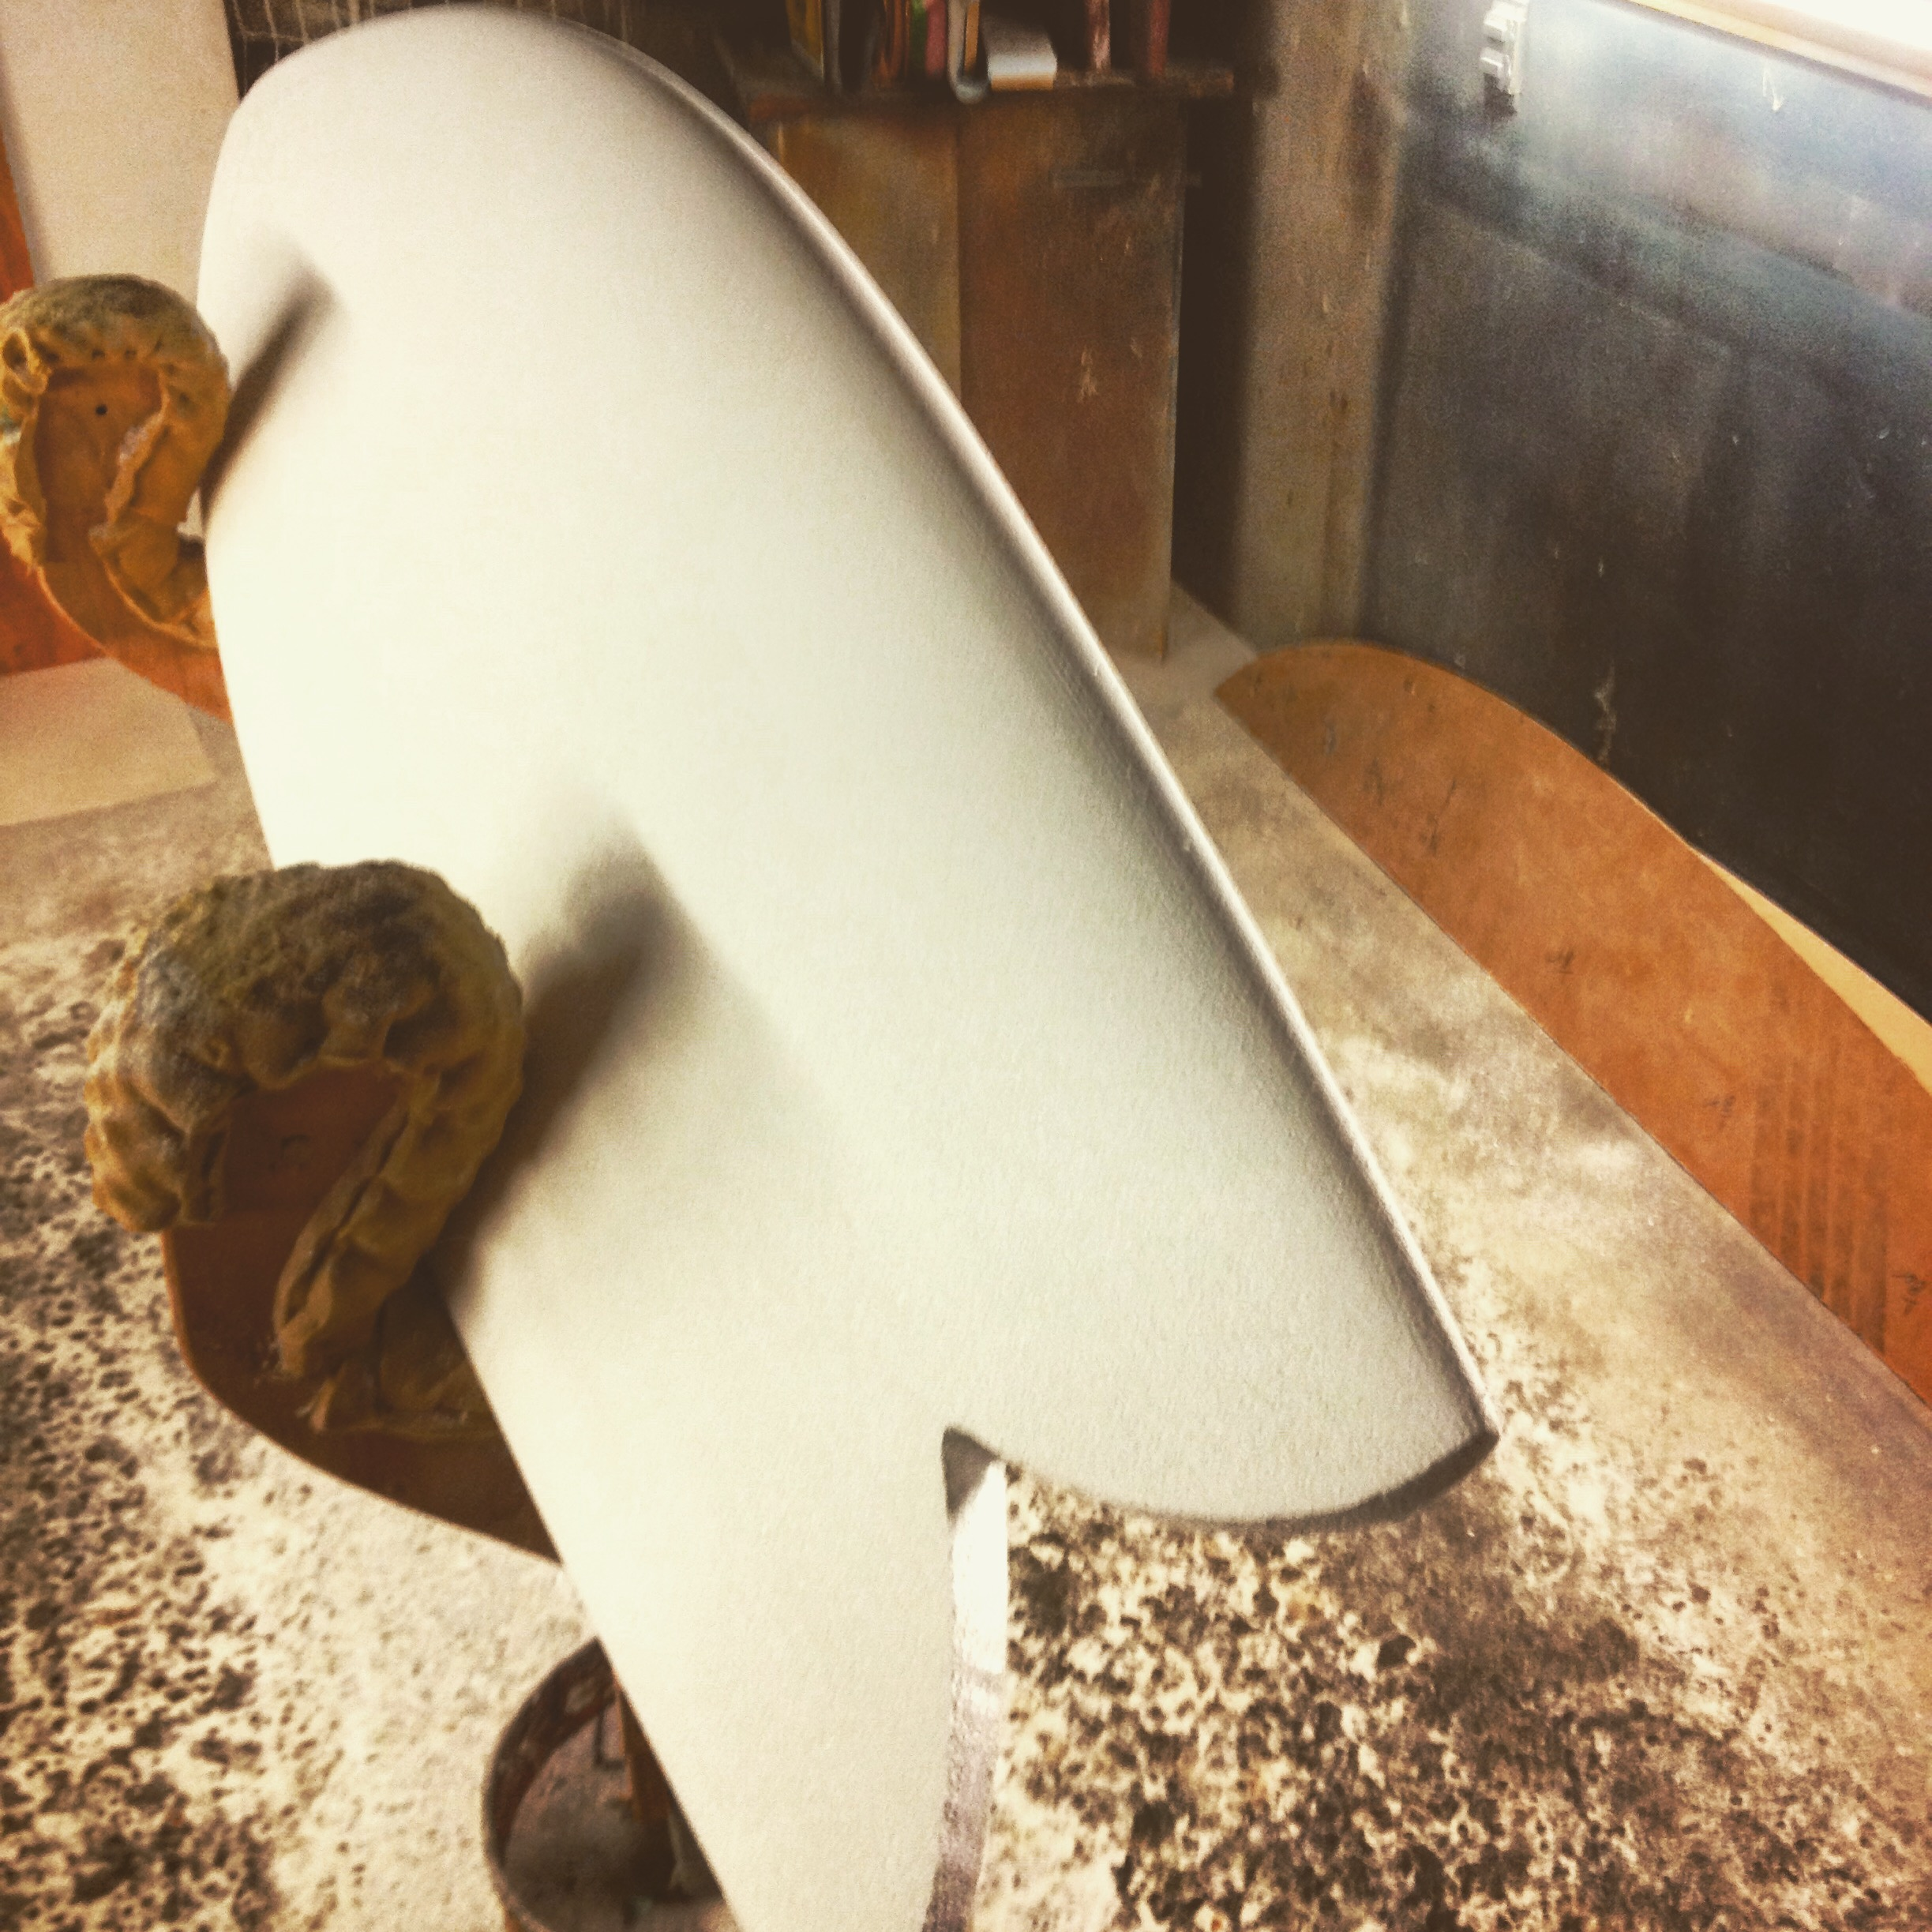 Union-of-Craft-Tilley-Surfboards-02.JPG